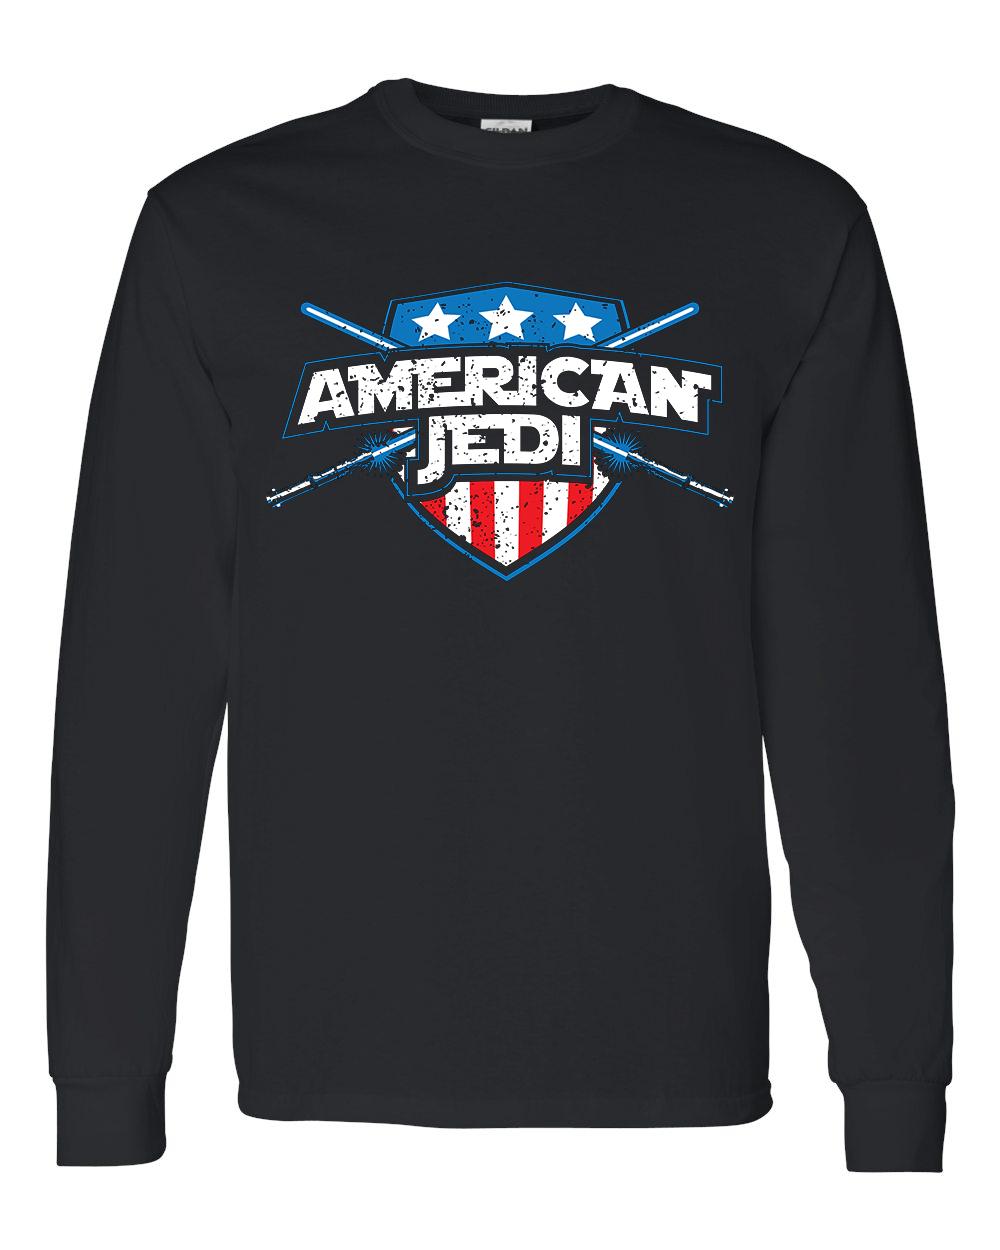 American Jedi shirt, long sleeve